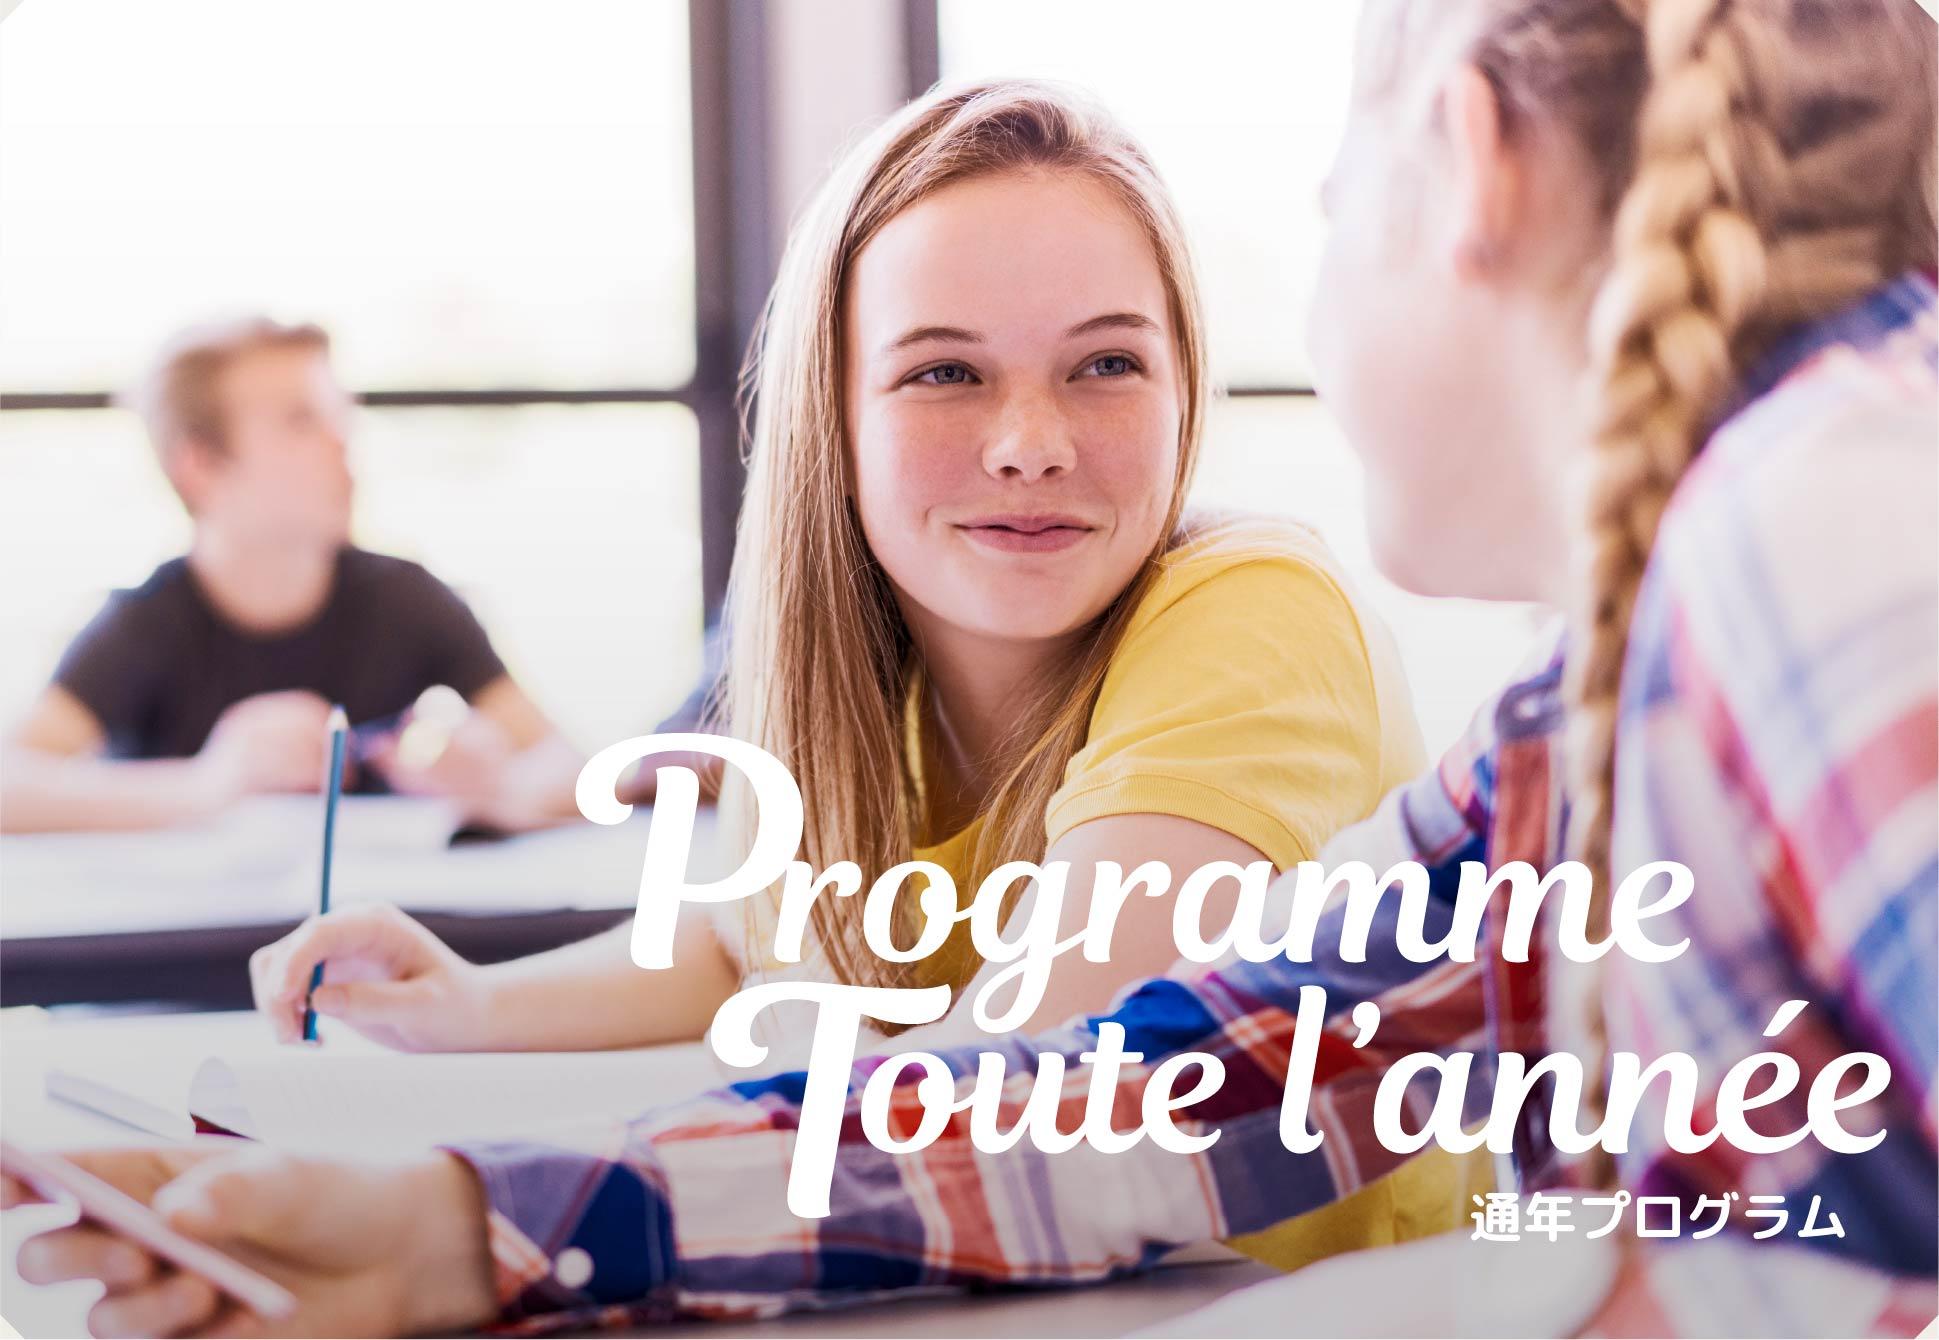 Programme Toute Lannee 通年プログラム